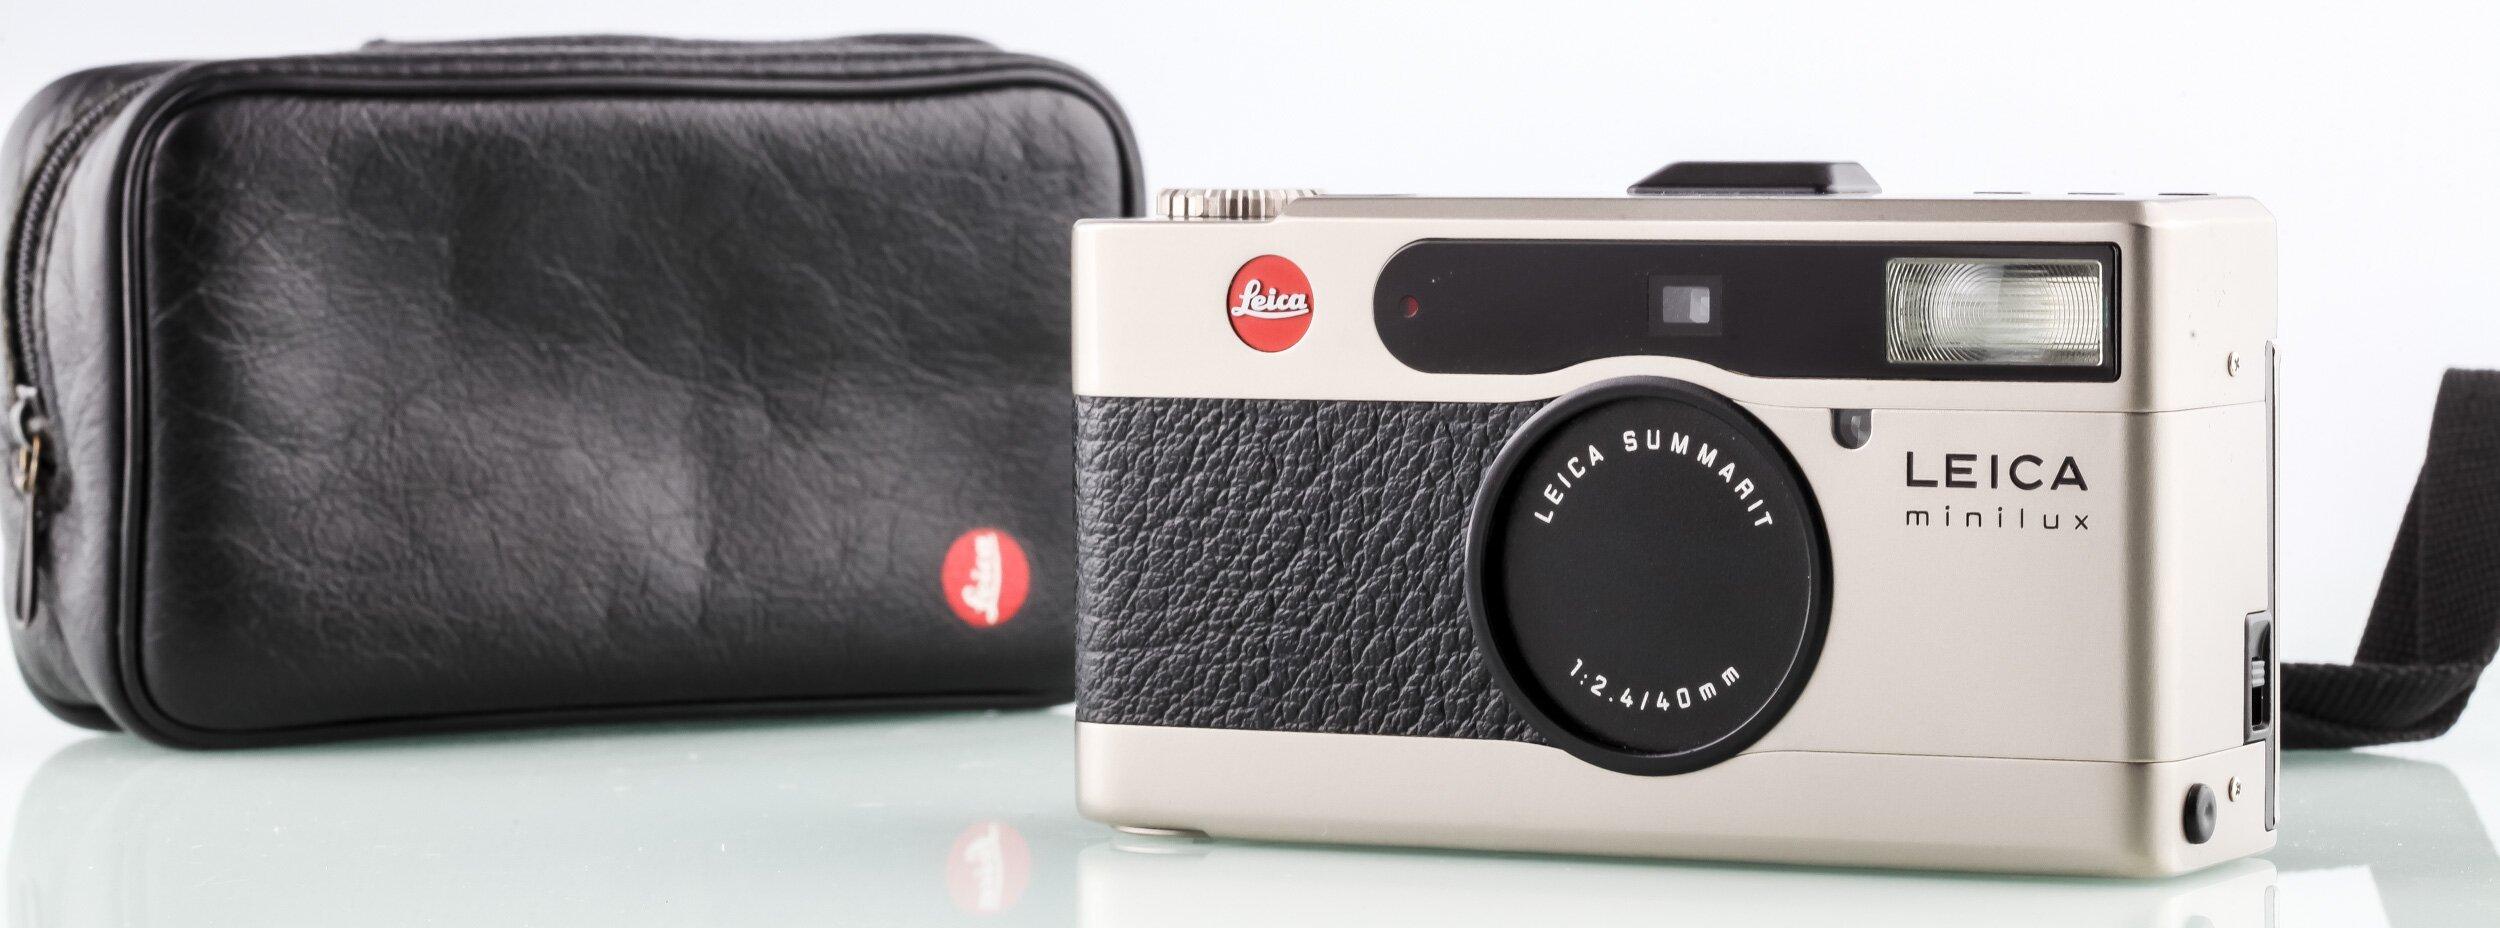 Leica Minilux 40mm F2.4 Leica Summarit original Kameratasche